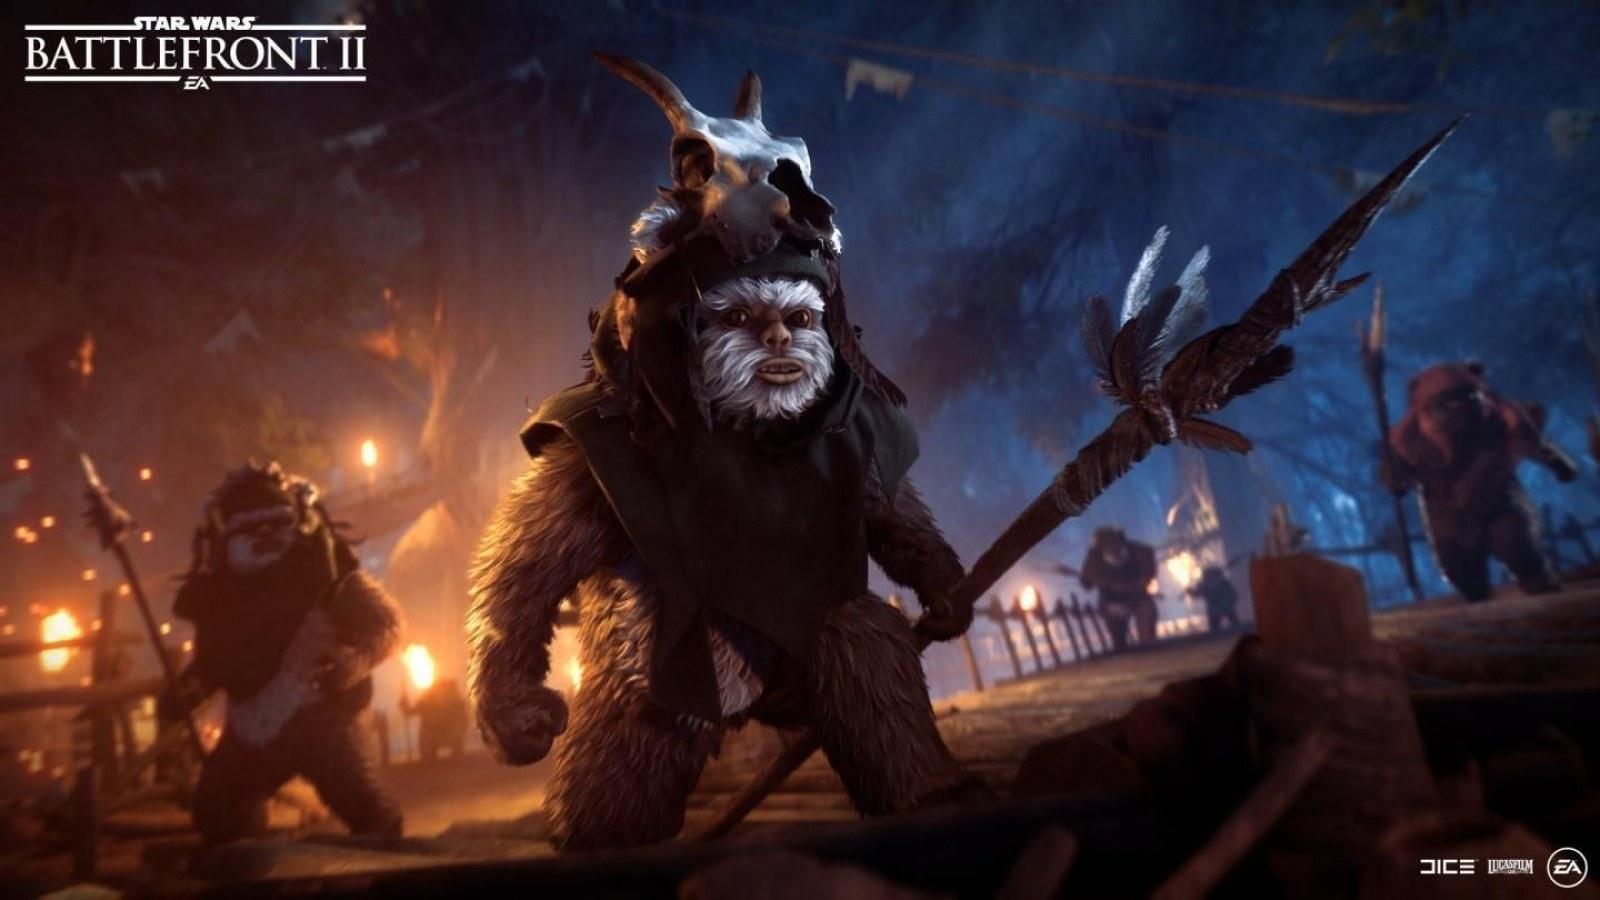 Star Wars Battlefront 2 Update 1 18 Adds Elite Corps Skins Patch Notes